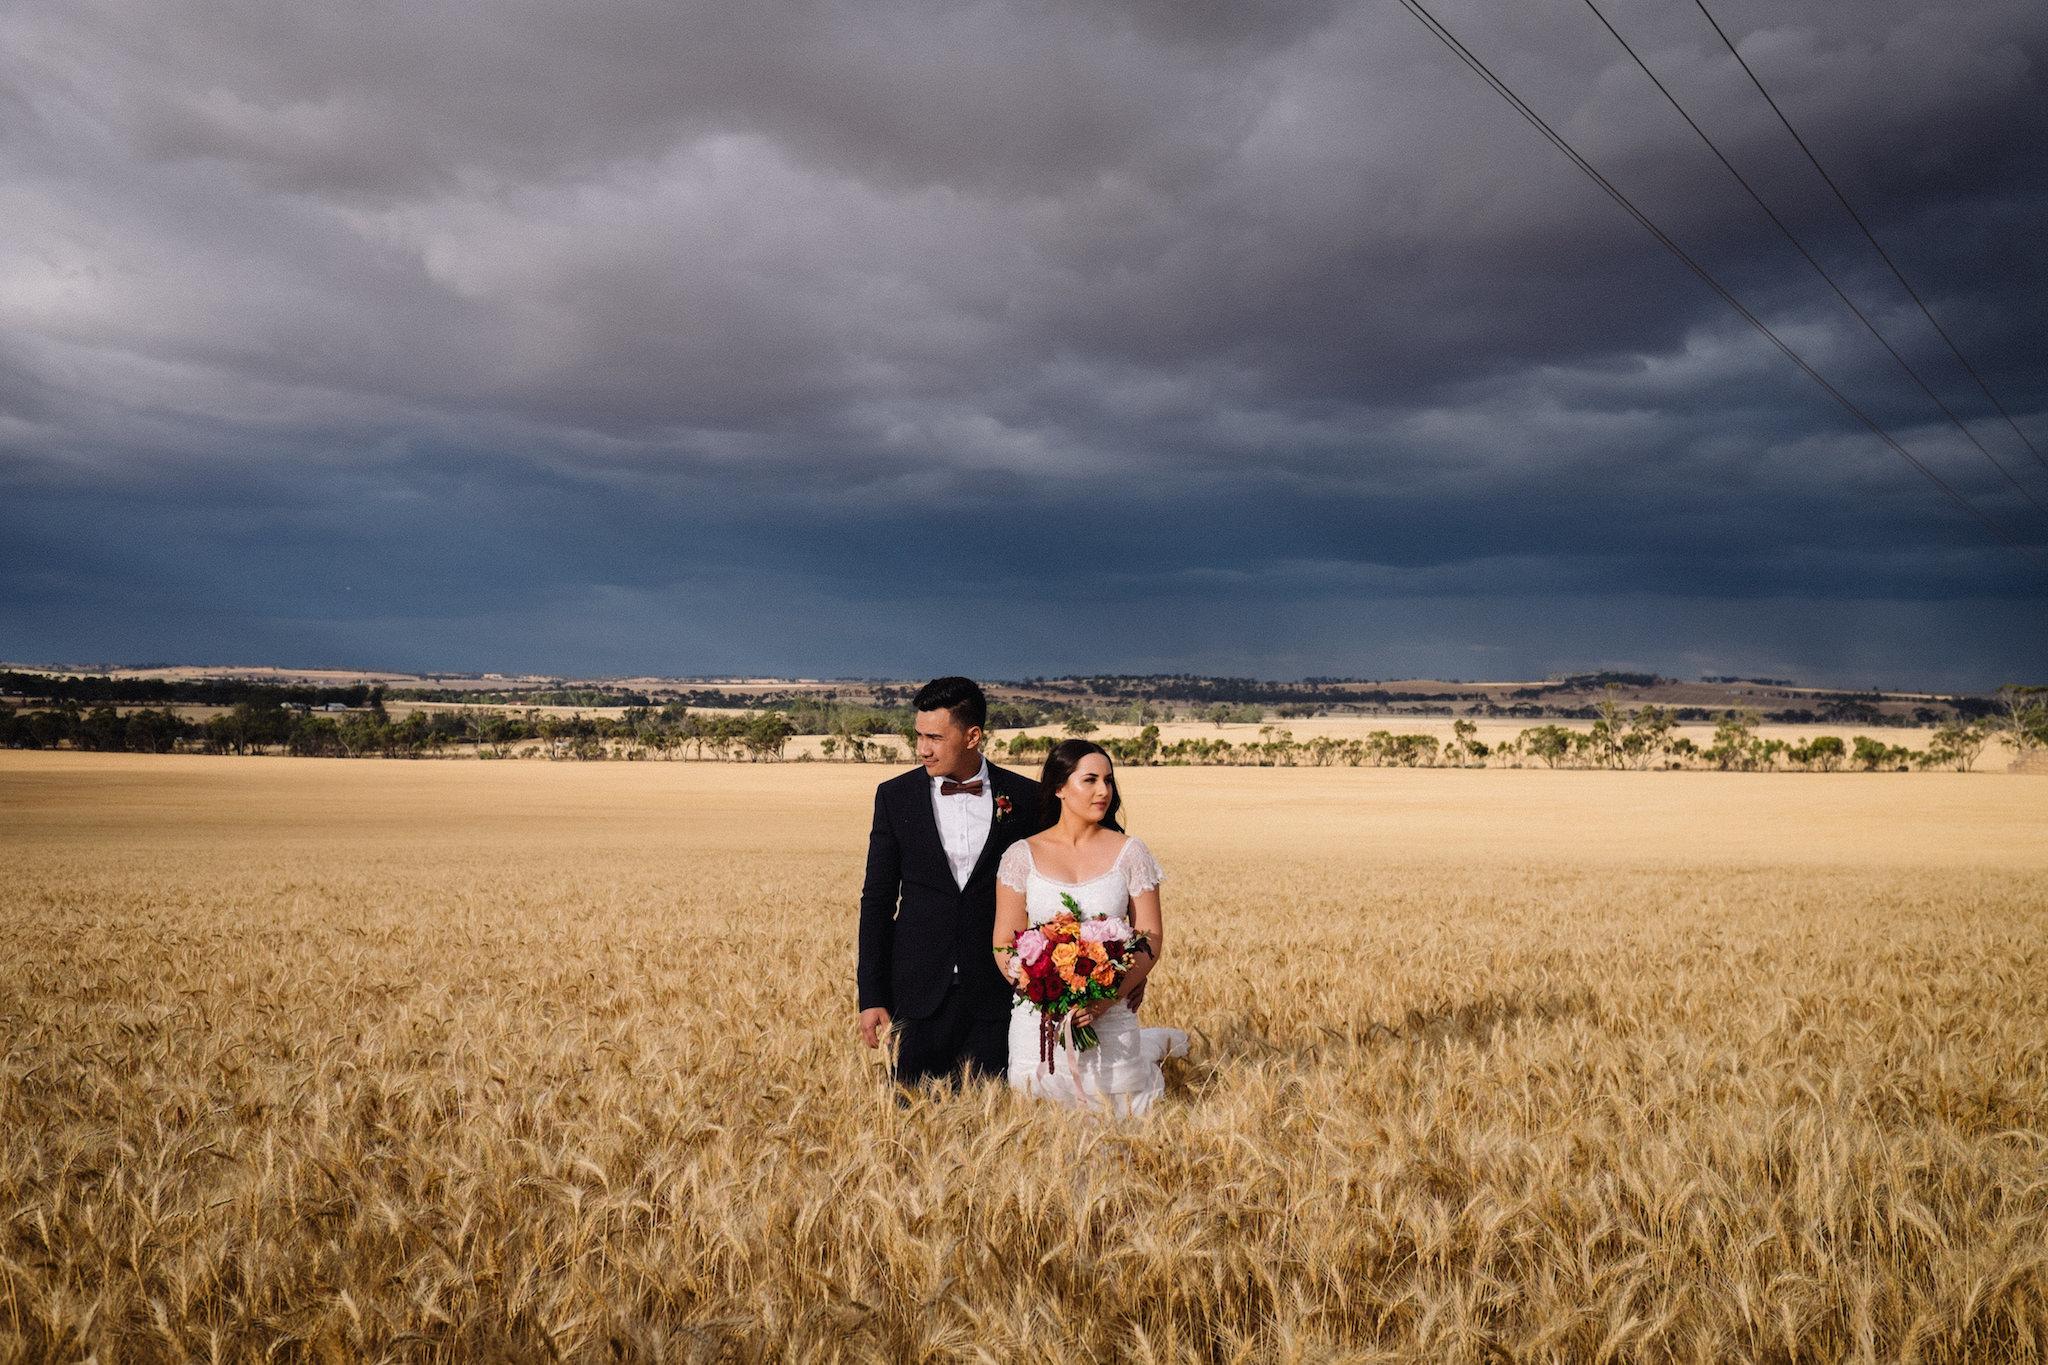 Avon Valley Wheat Field Sarah Marvin York Wedding Photographer 1